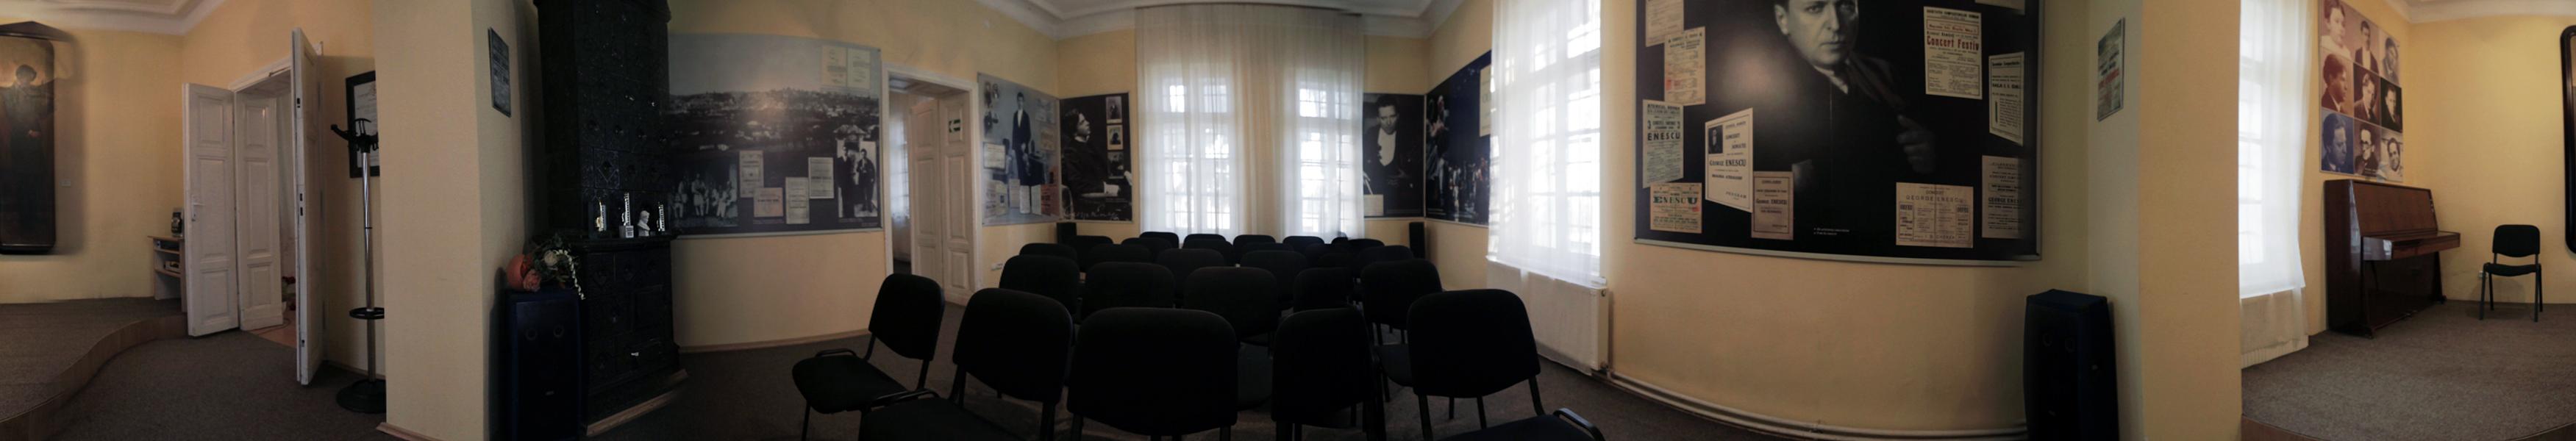 "Muzeul Memorial ""George Enescu"""